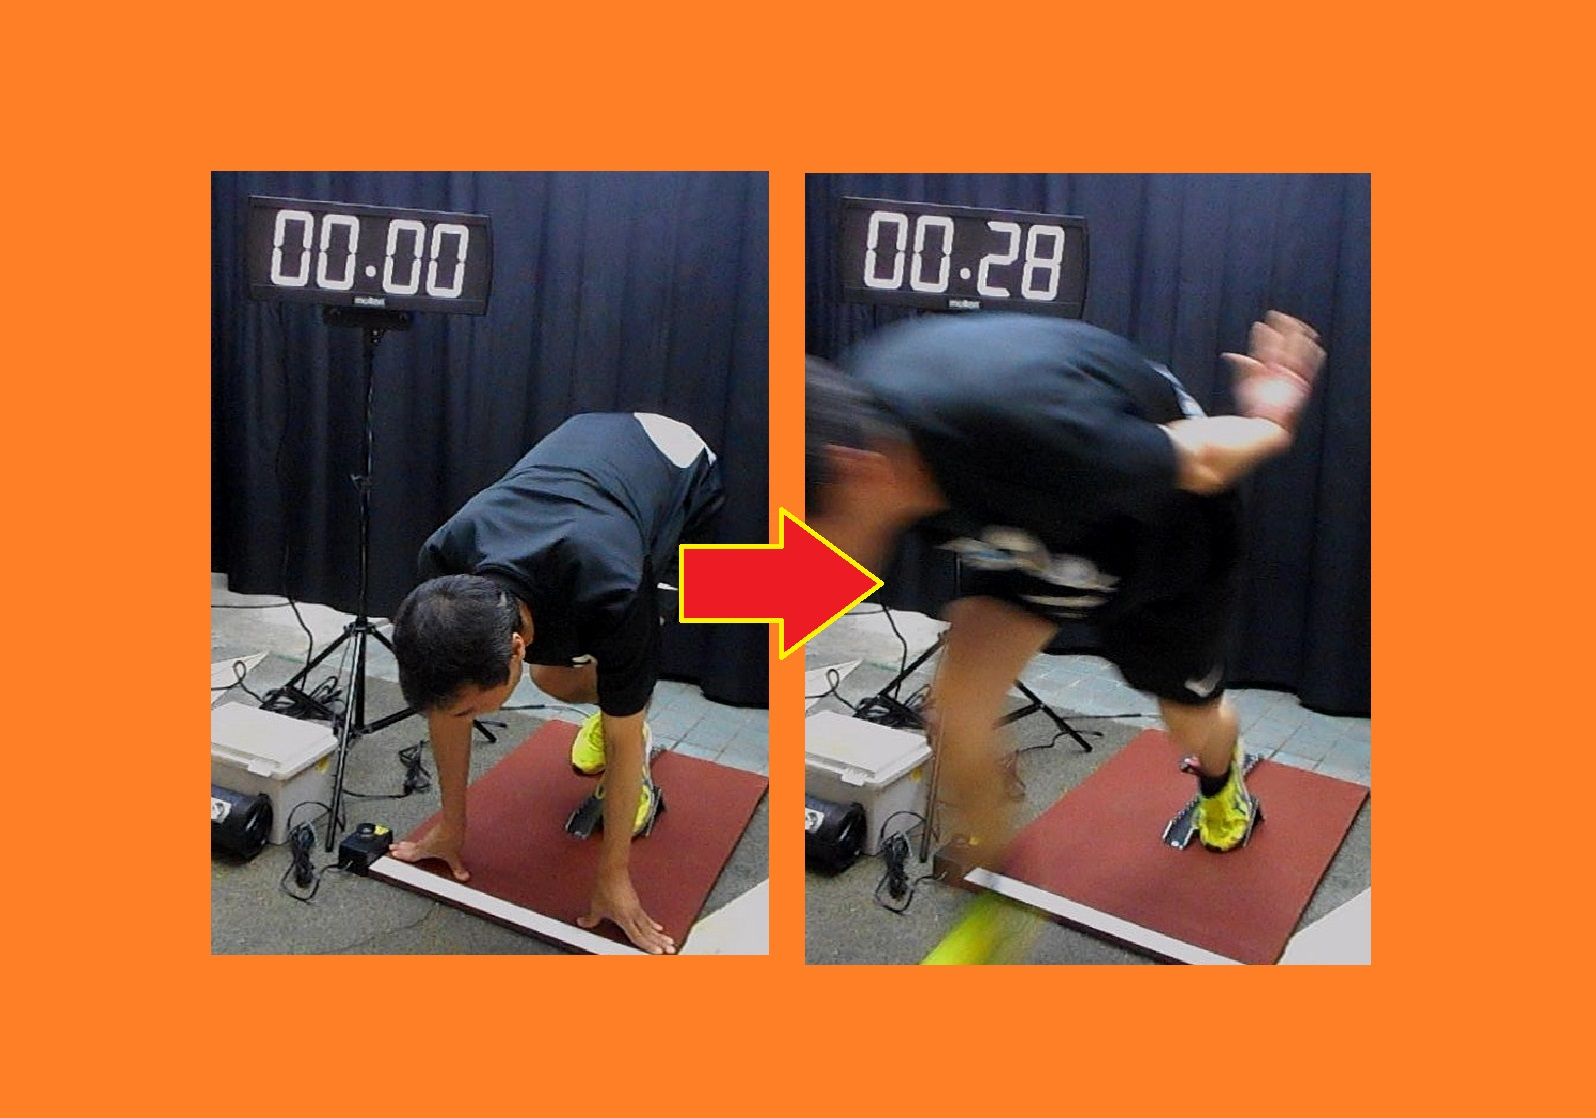 0m走(ウサイン ボルト選手に挑戦、陸上競技 スタート 反射神経 測定装置)